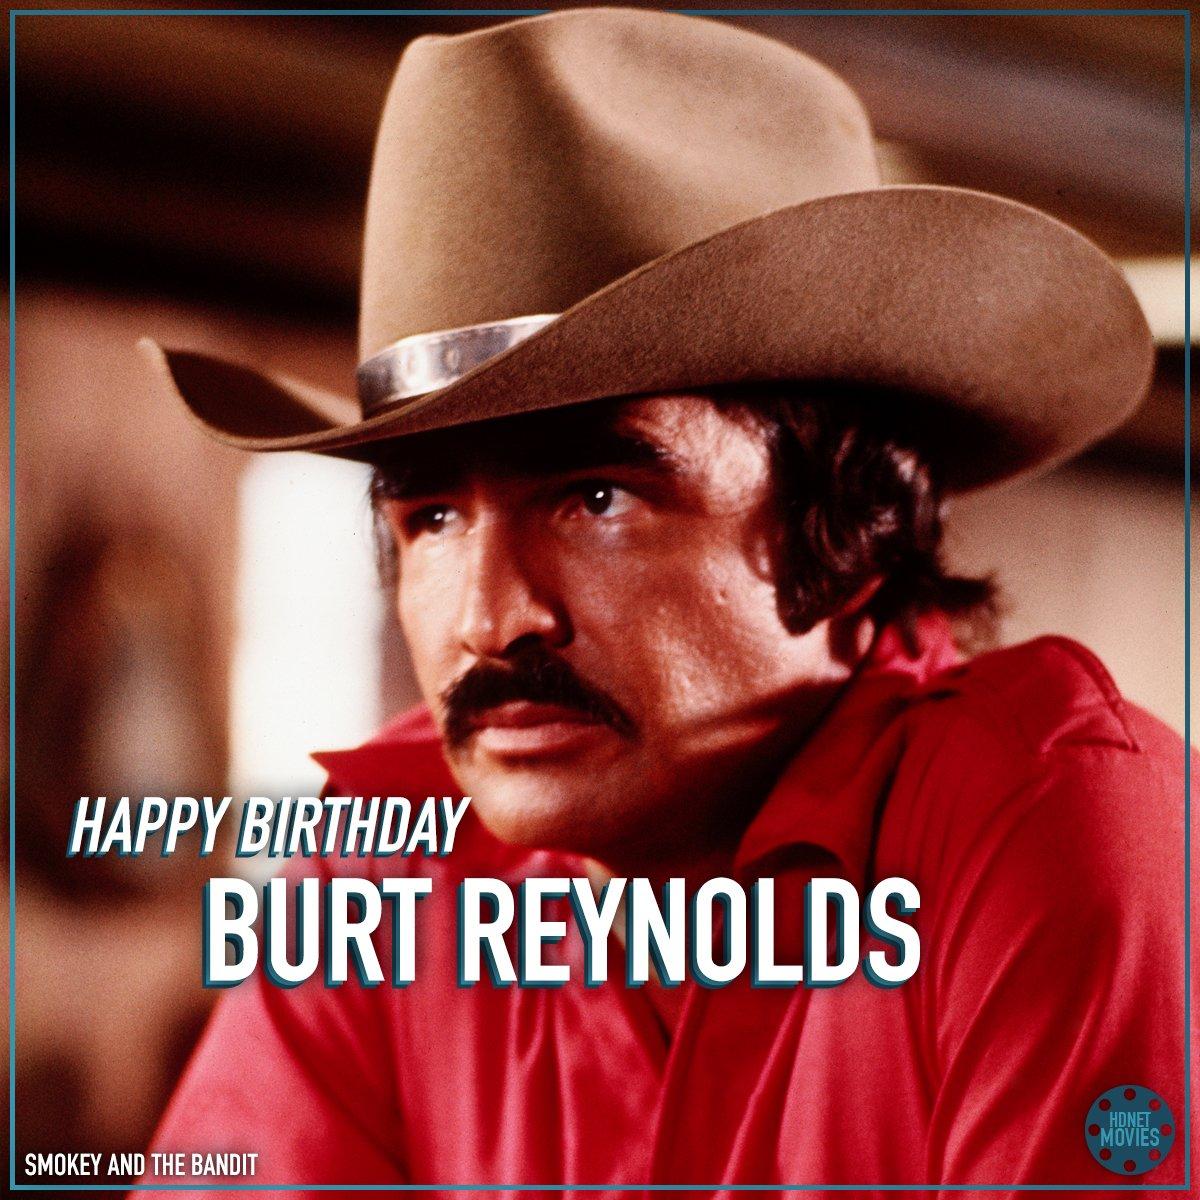 Bandit is 82 today! Happy Birthday, Burt Reynolds!